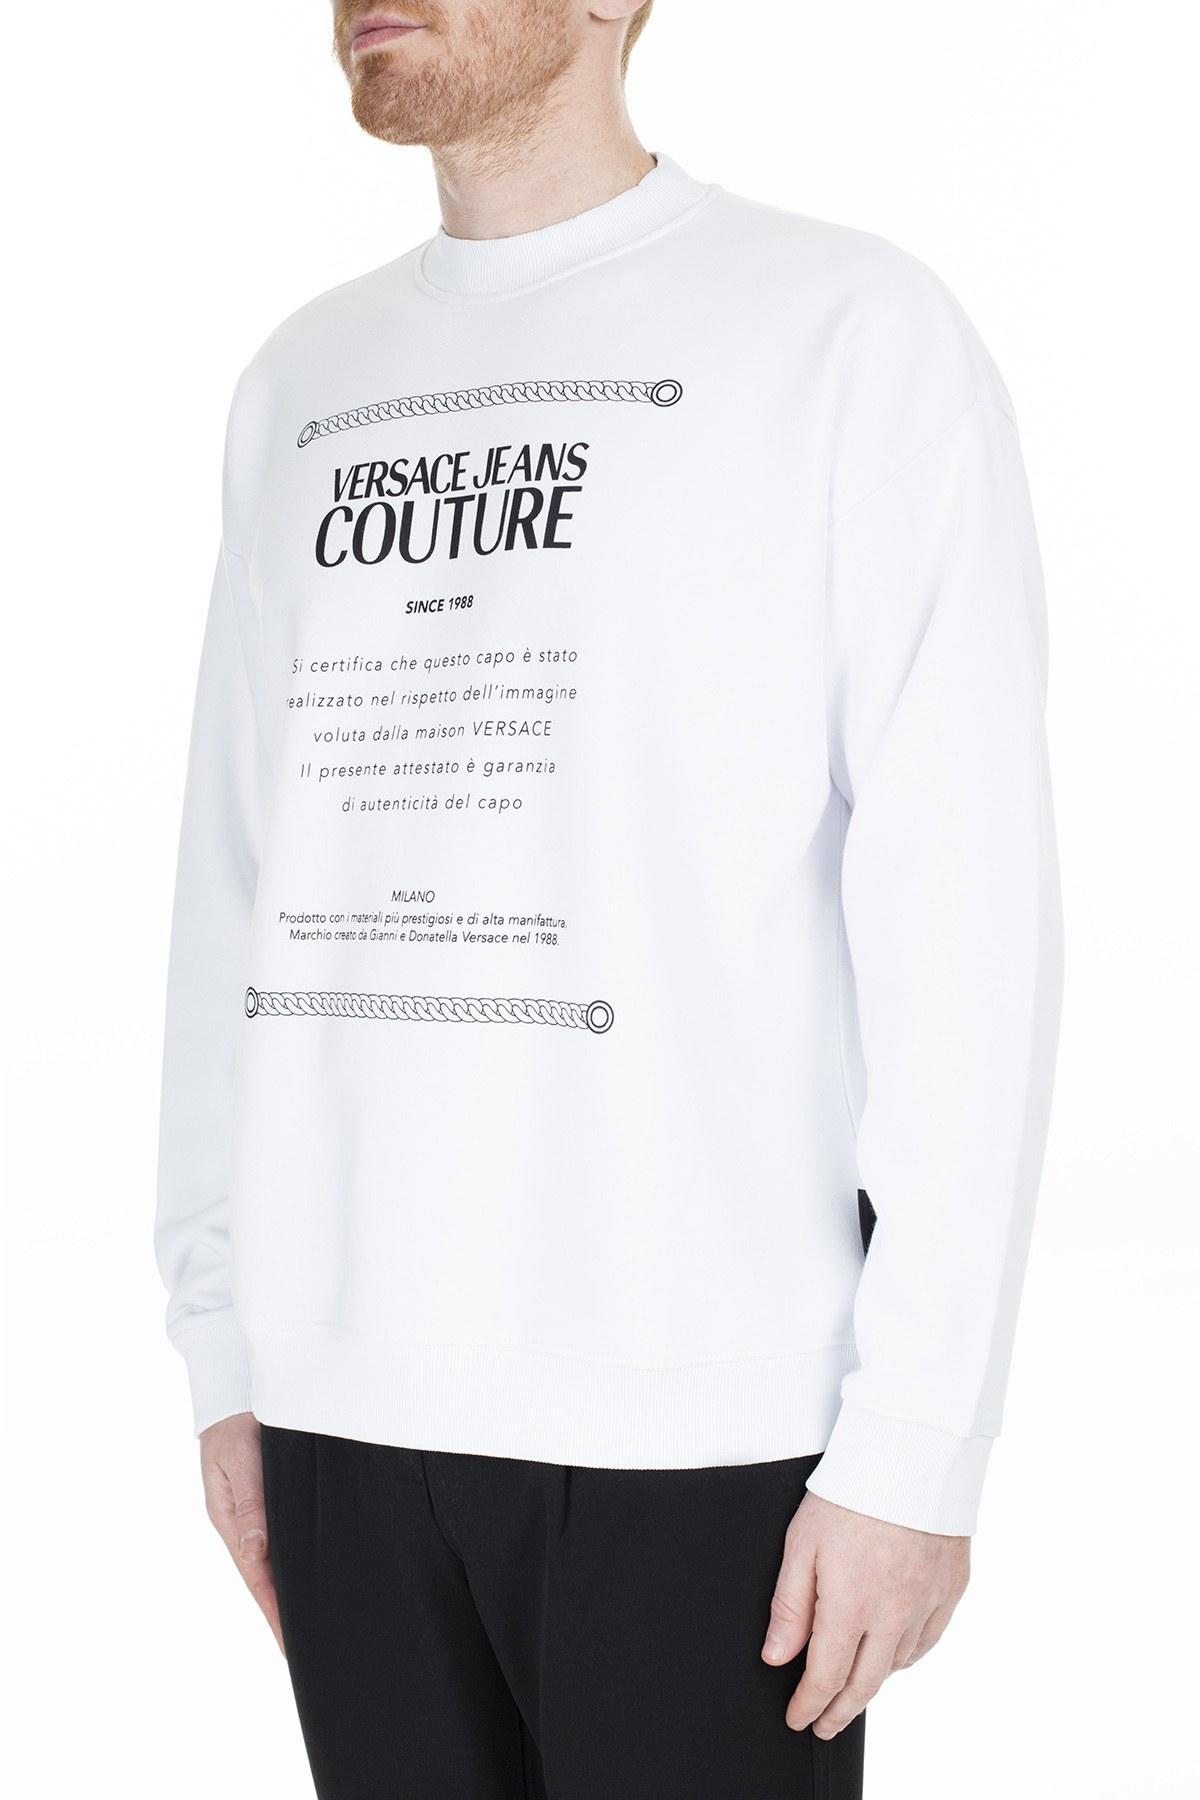 Versace Jeans Couture Erkek Sweat S B7GUA7F7 30216003 BEYAZ